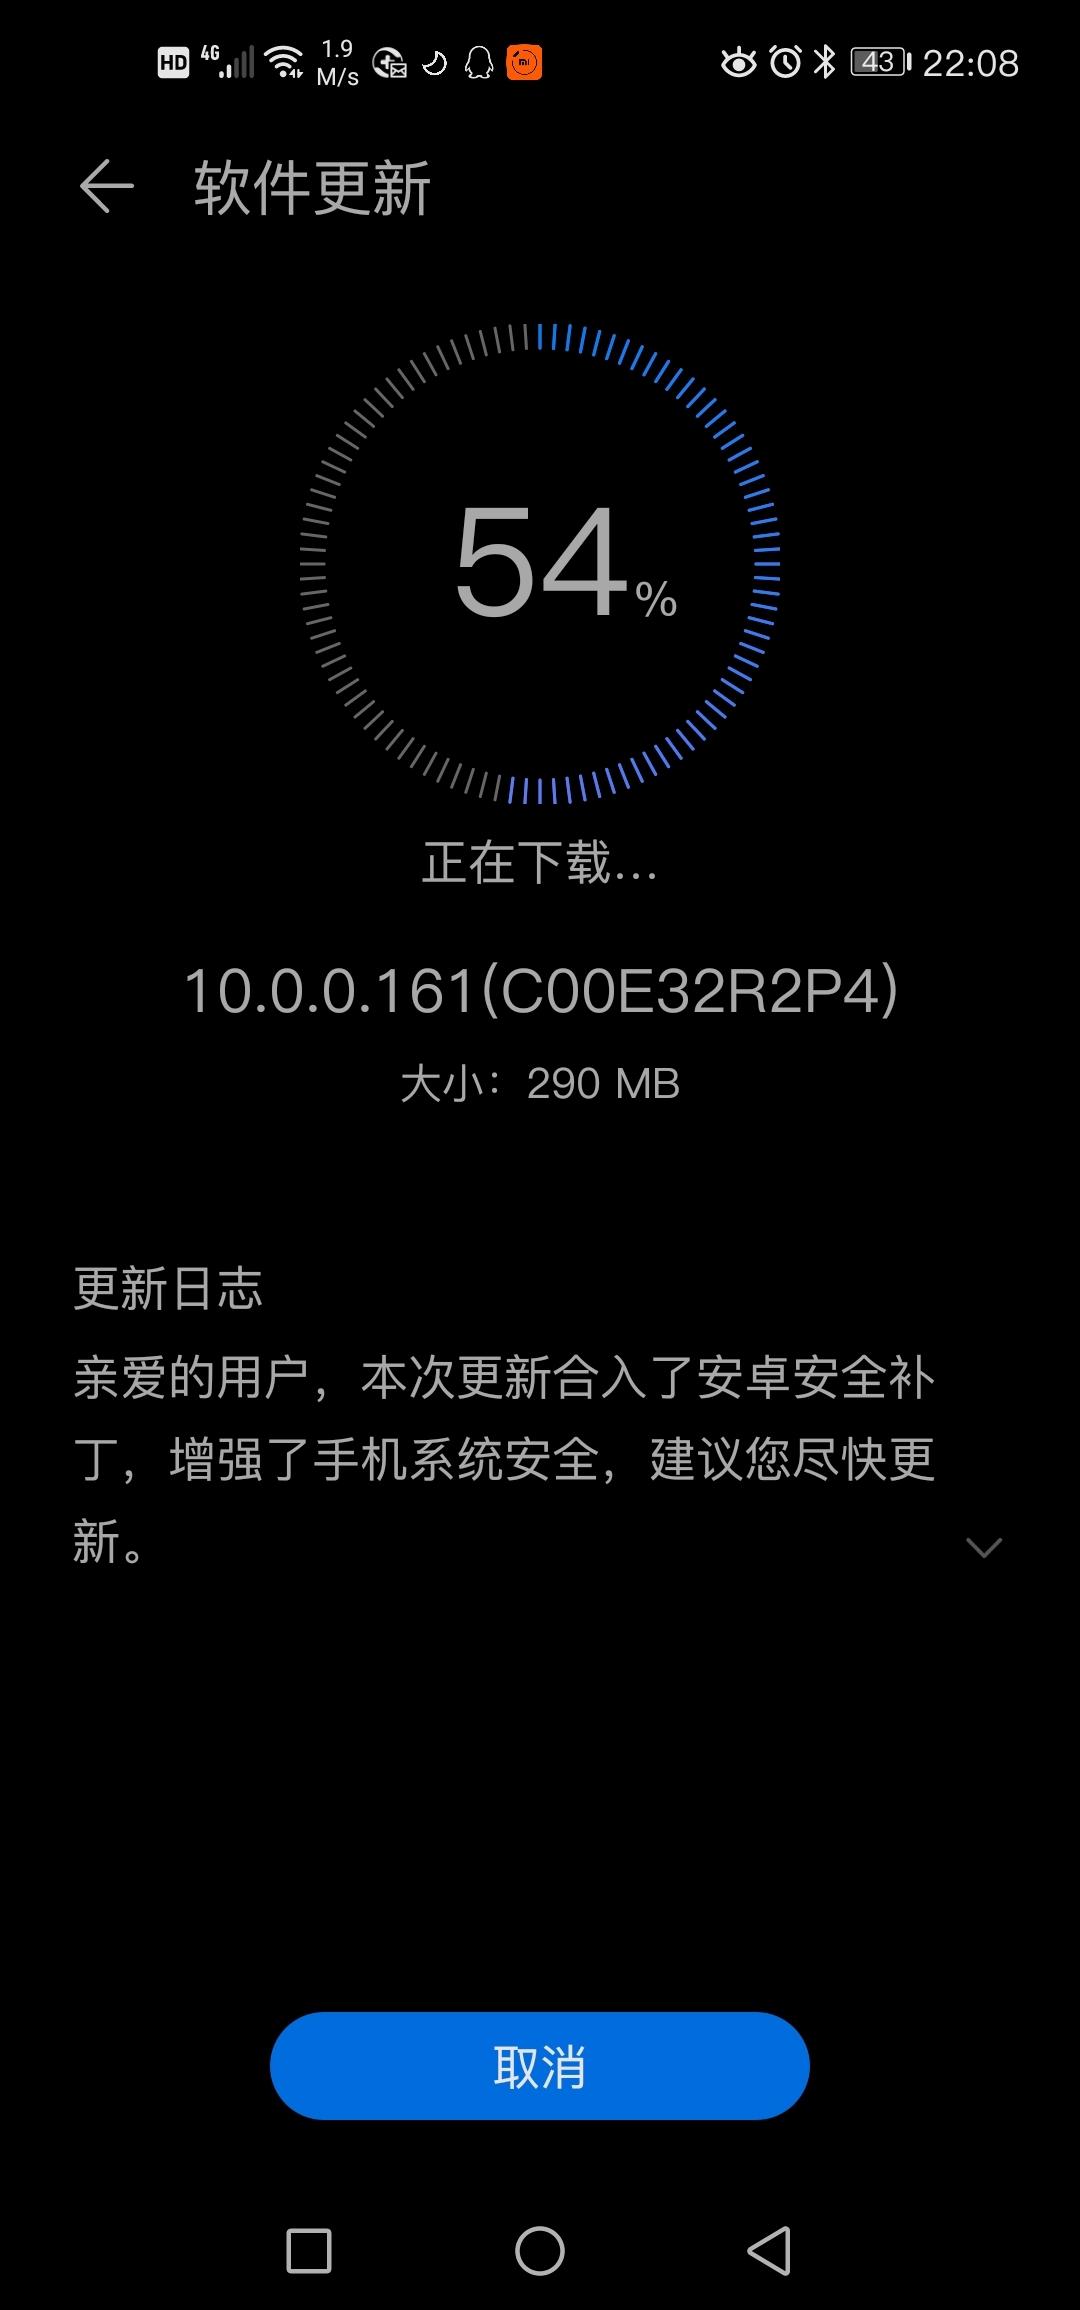 Screenshot_20200706_220858_com.huawei.android.hwouc.jpg